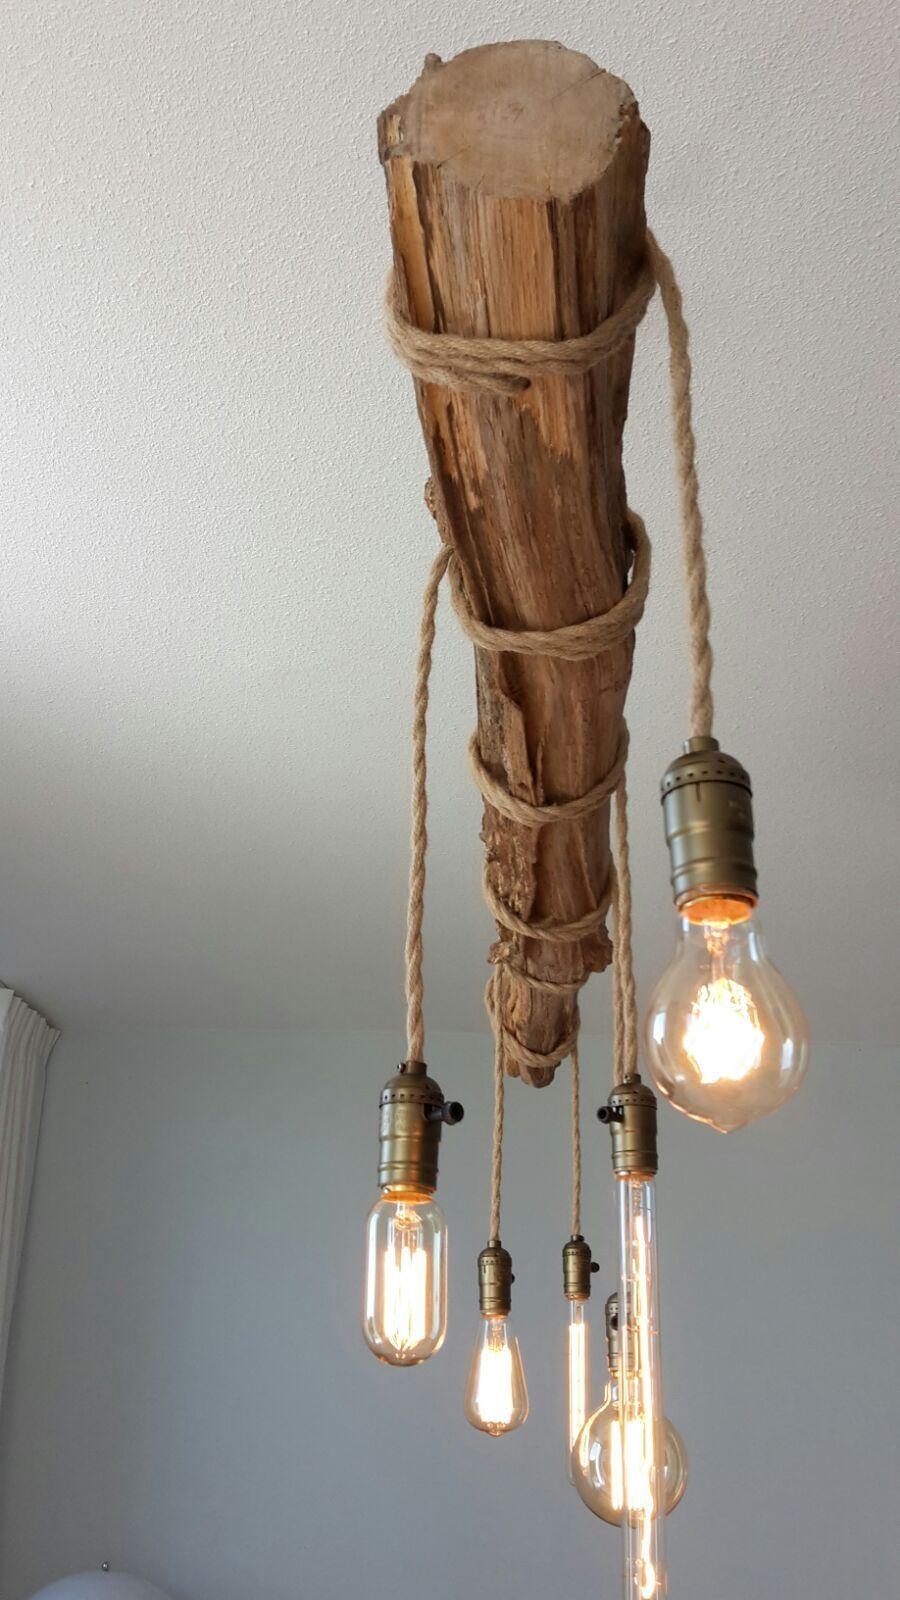 Boomstam Lamp Www Marktplaats Nl Leather Living Room Set Hanging Lamp Living Room Leather